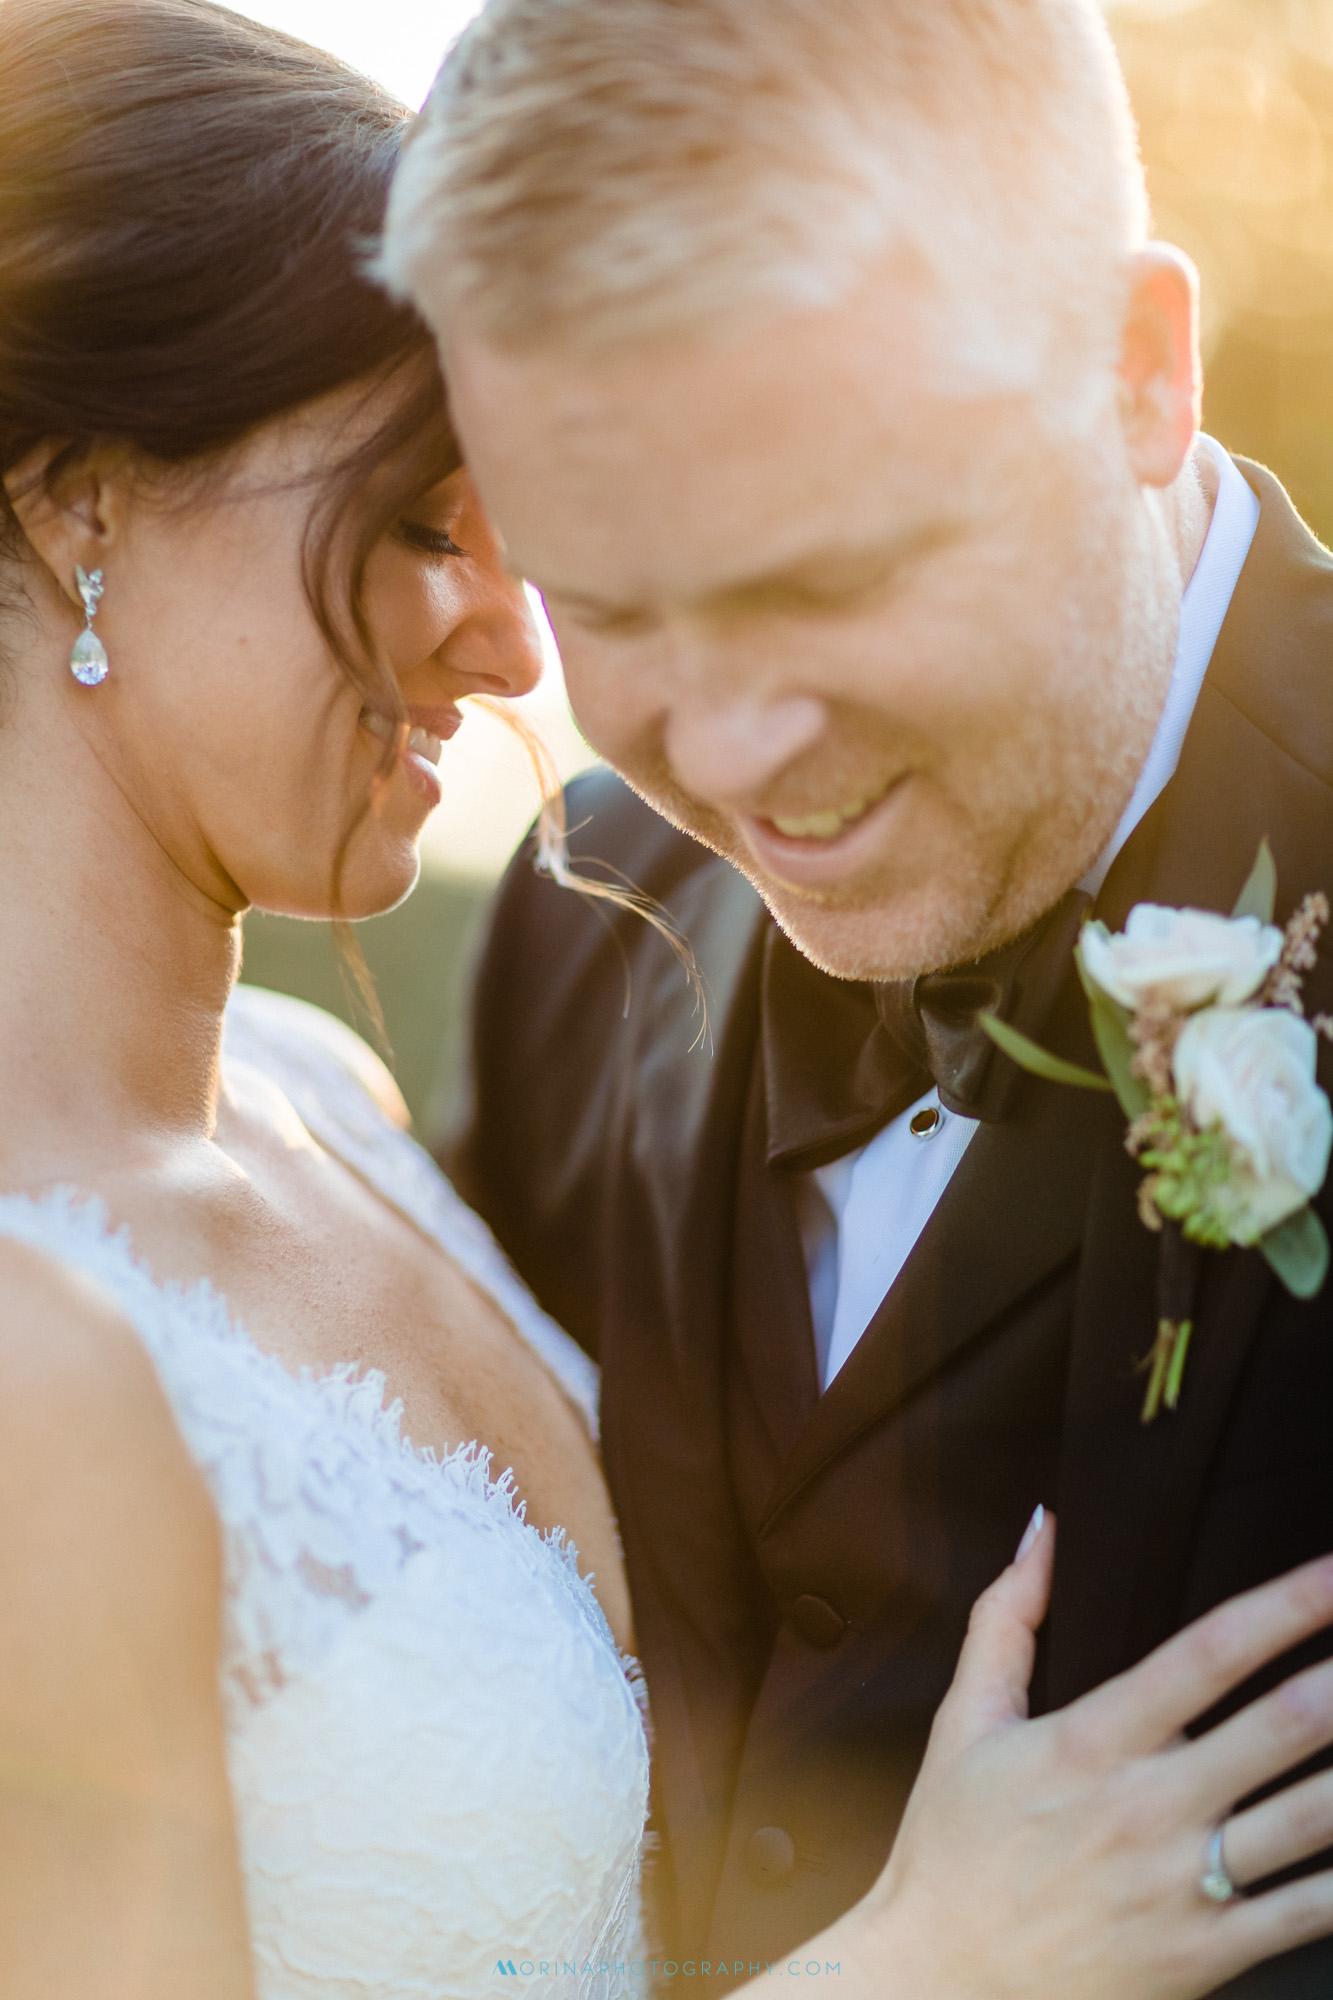 Colleen & Bill Wedding at Manufacturers' Golf & Country Club wedding 0066.jpg